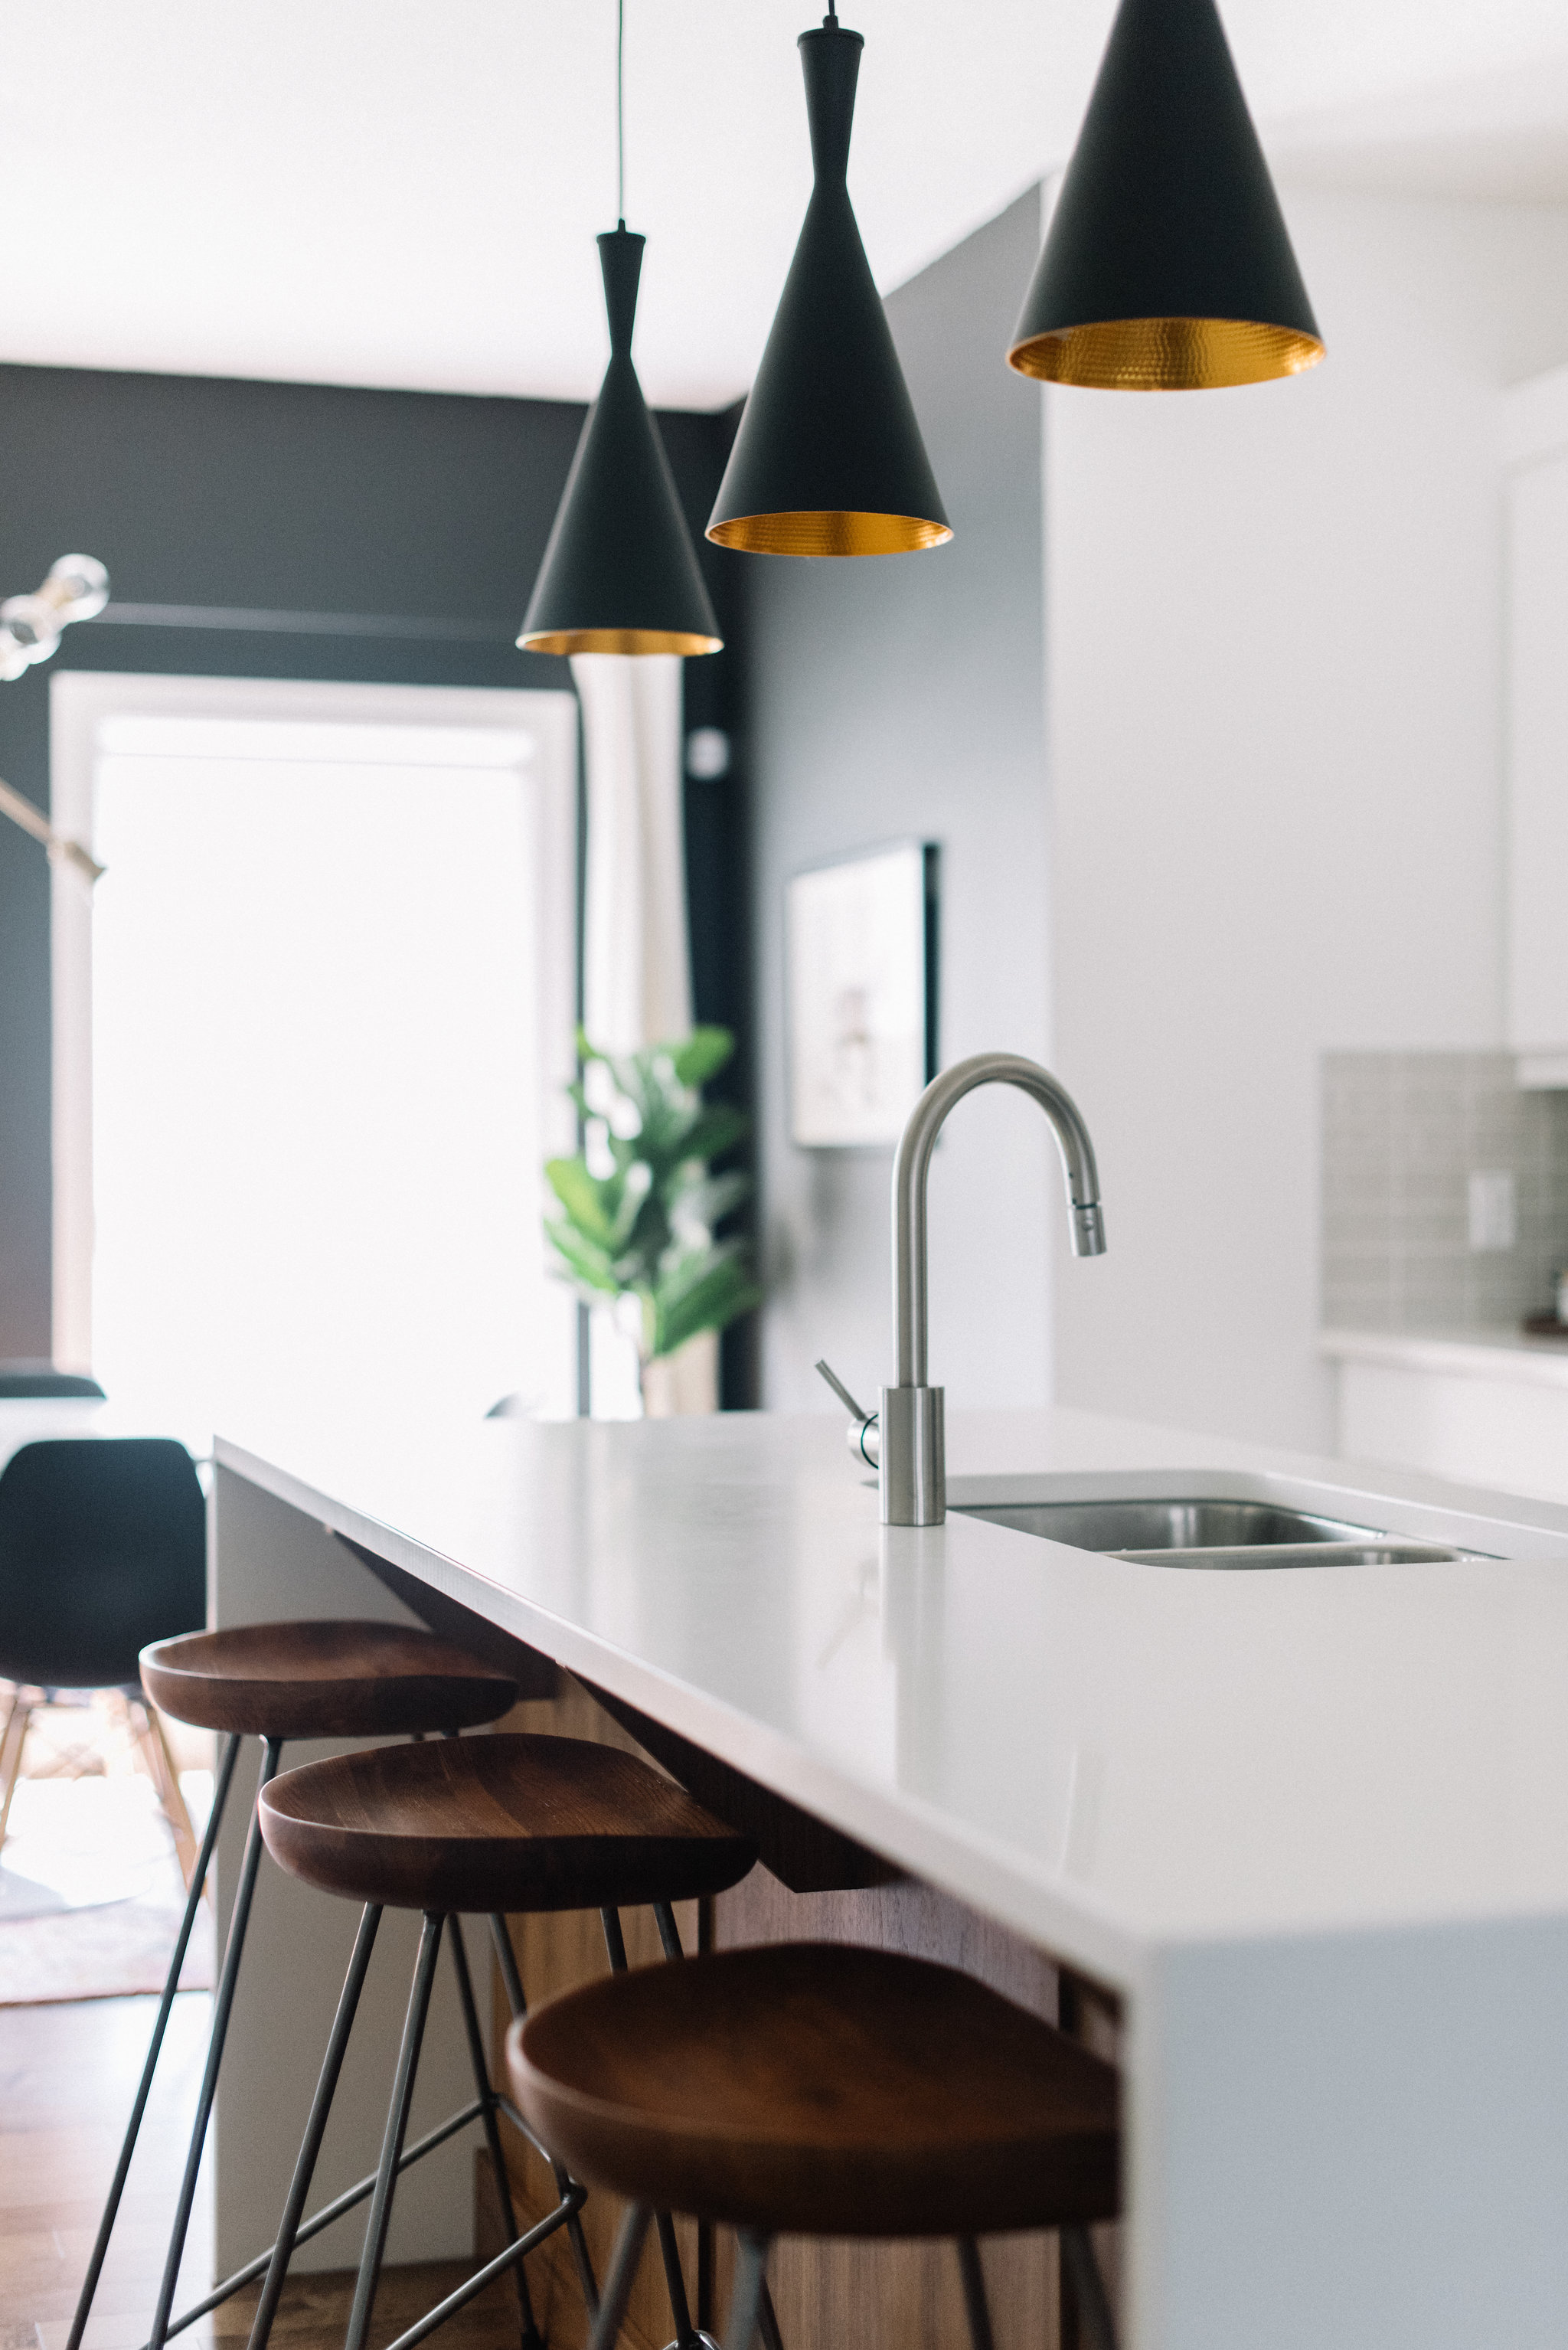 white modern kitchen, wooden barstools